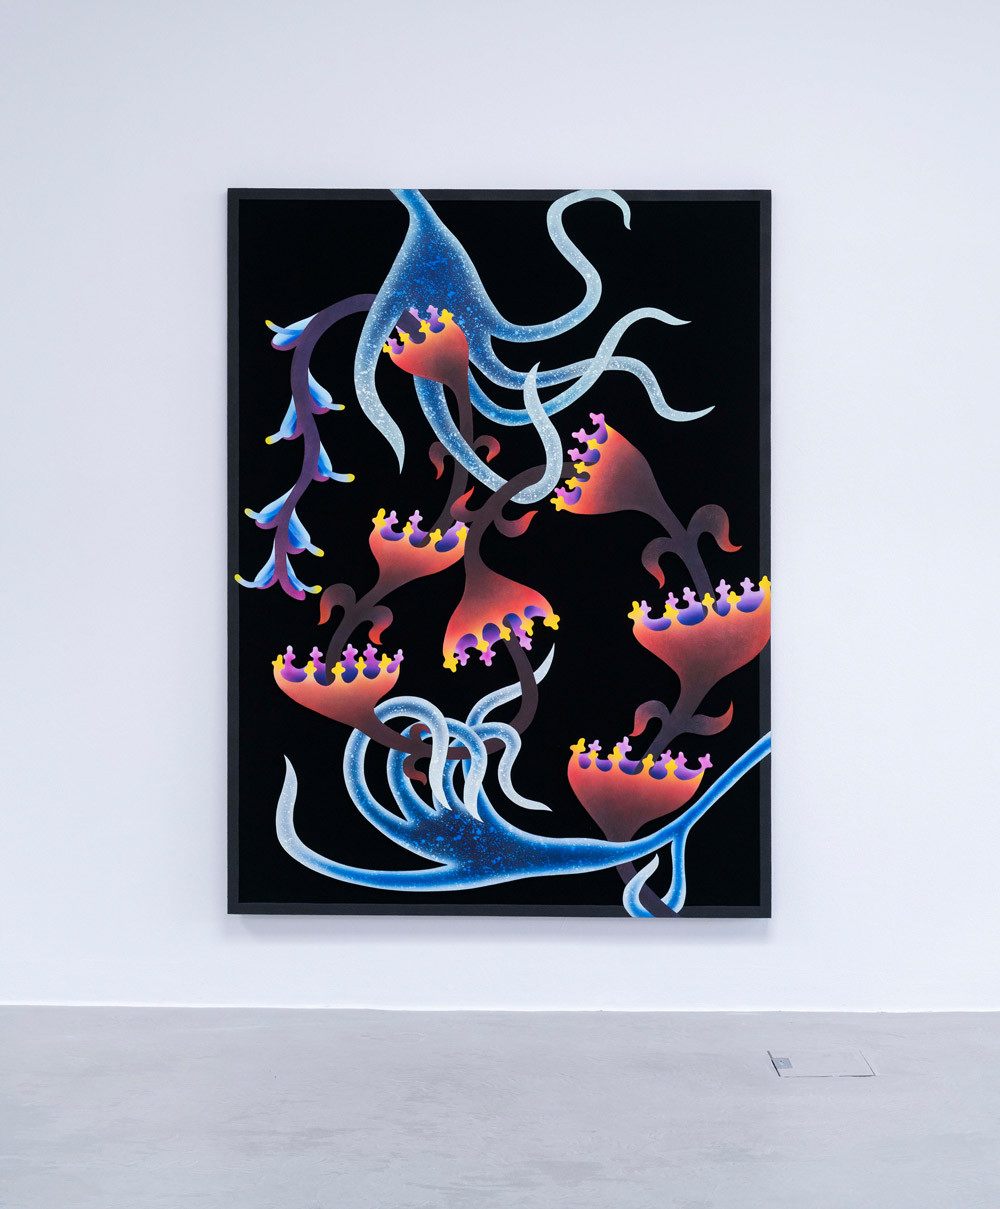 RPR ART, Mevlana Lipp, Calypso, 2020, 200x50cm, Ruttkowski Gallery